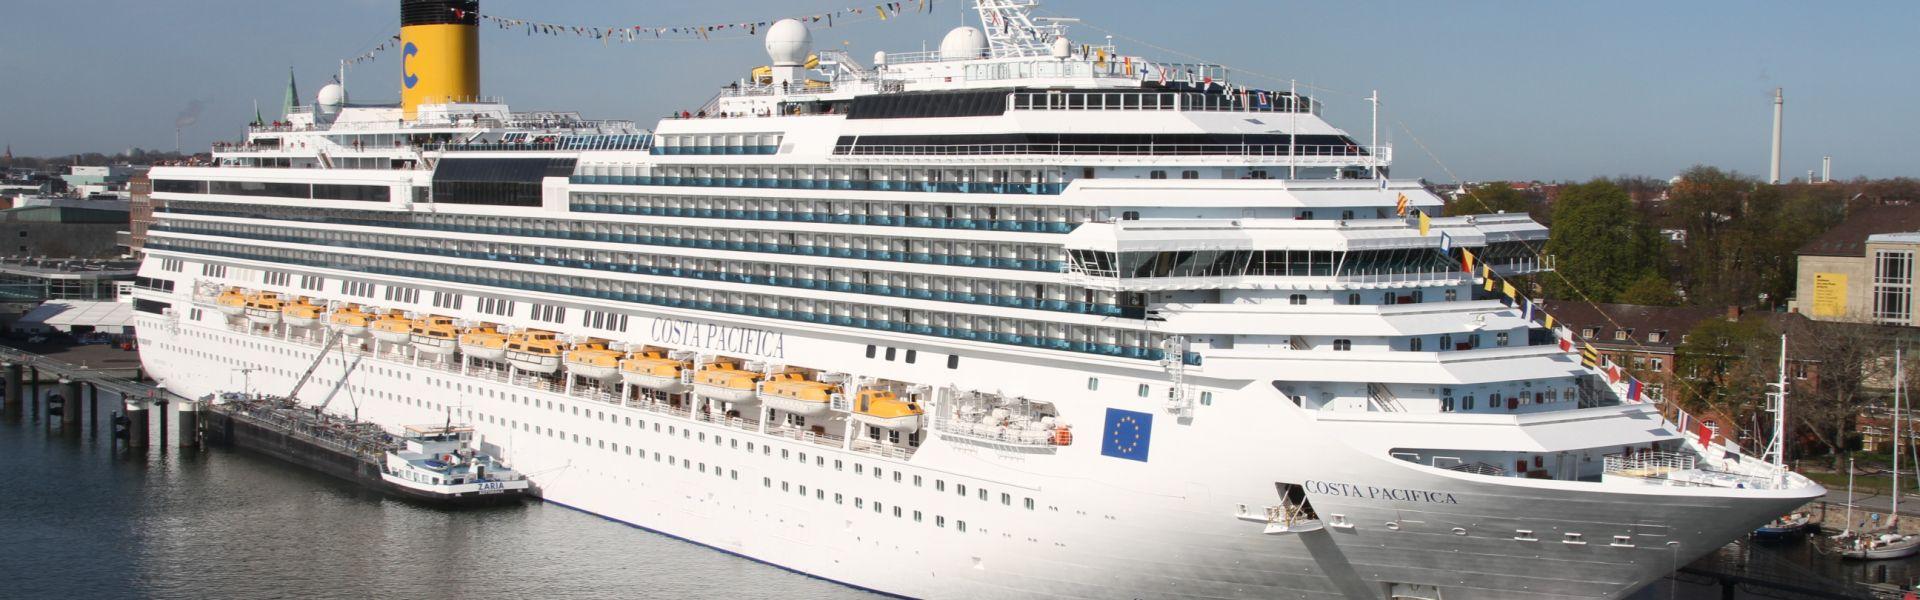 Croaziera 2017 - Europa de Vest (Kiel) - Costa Cruises - Pacifica - 11 nopti